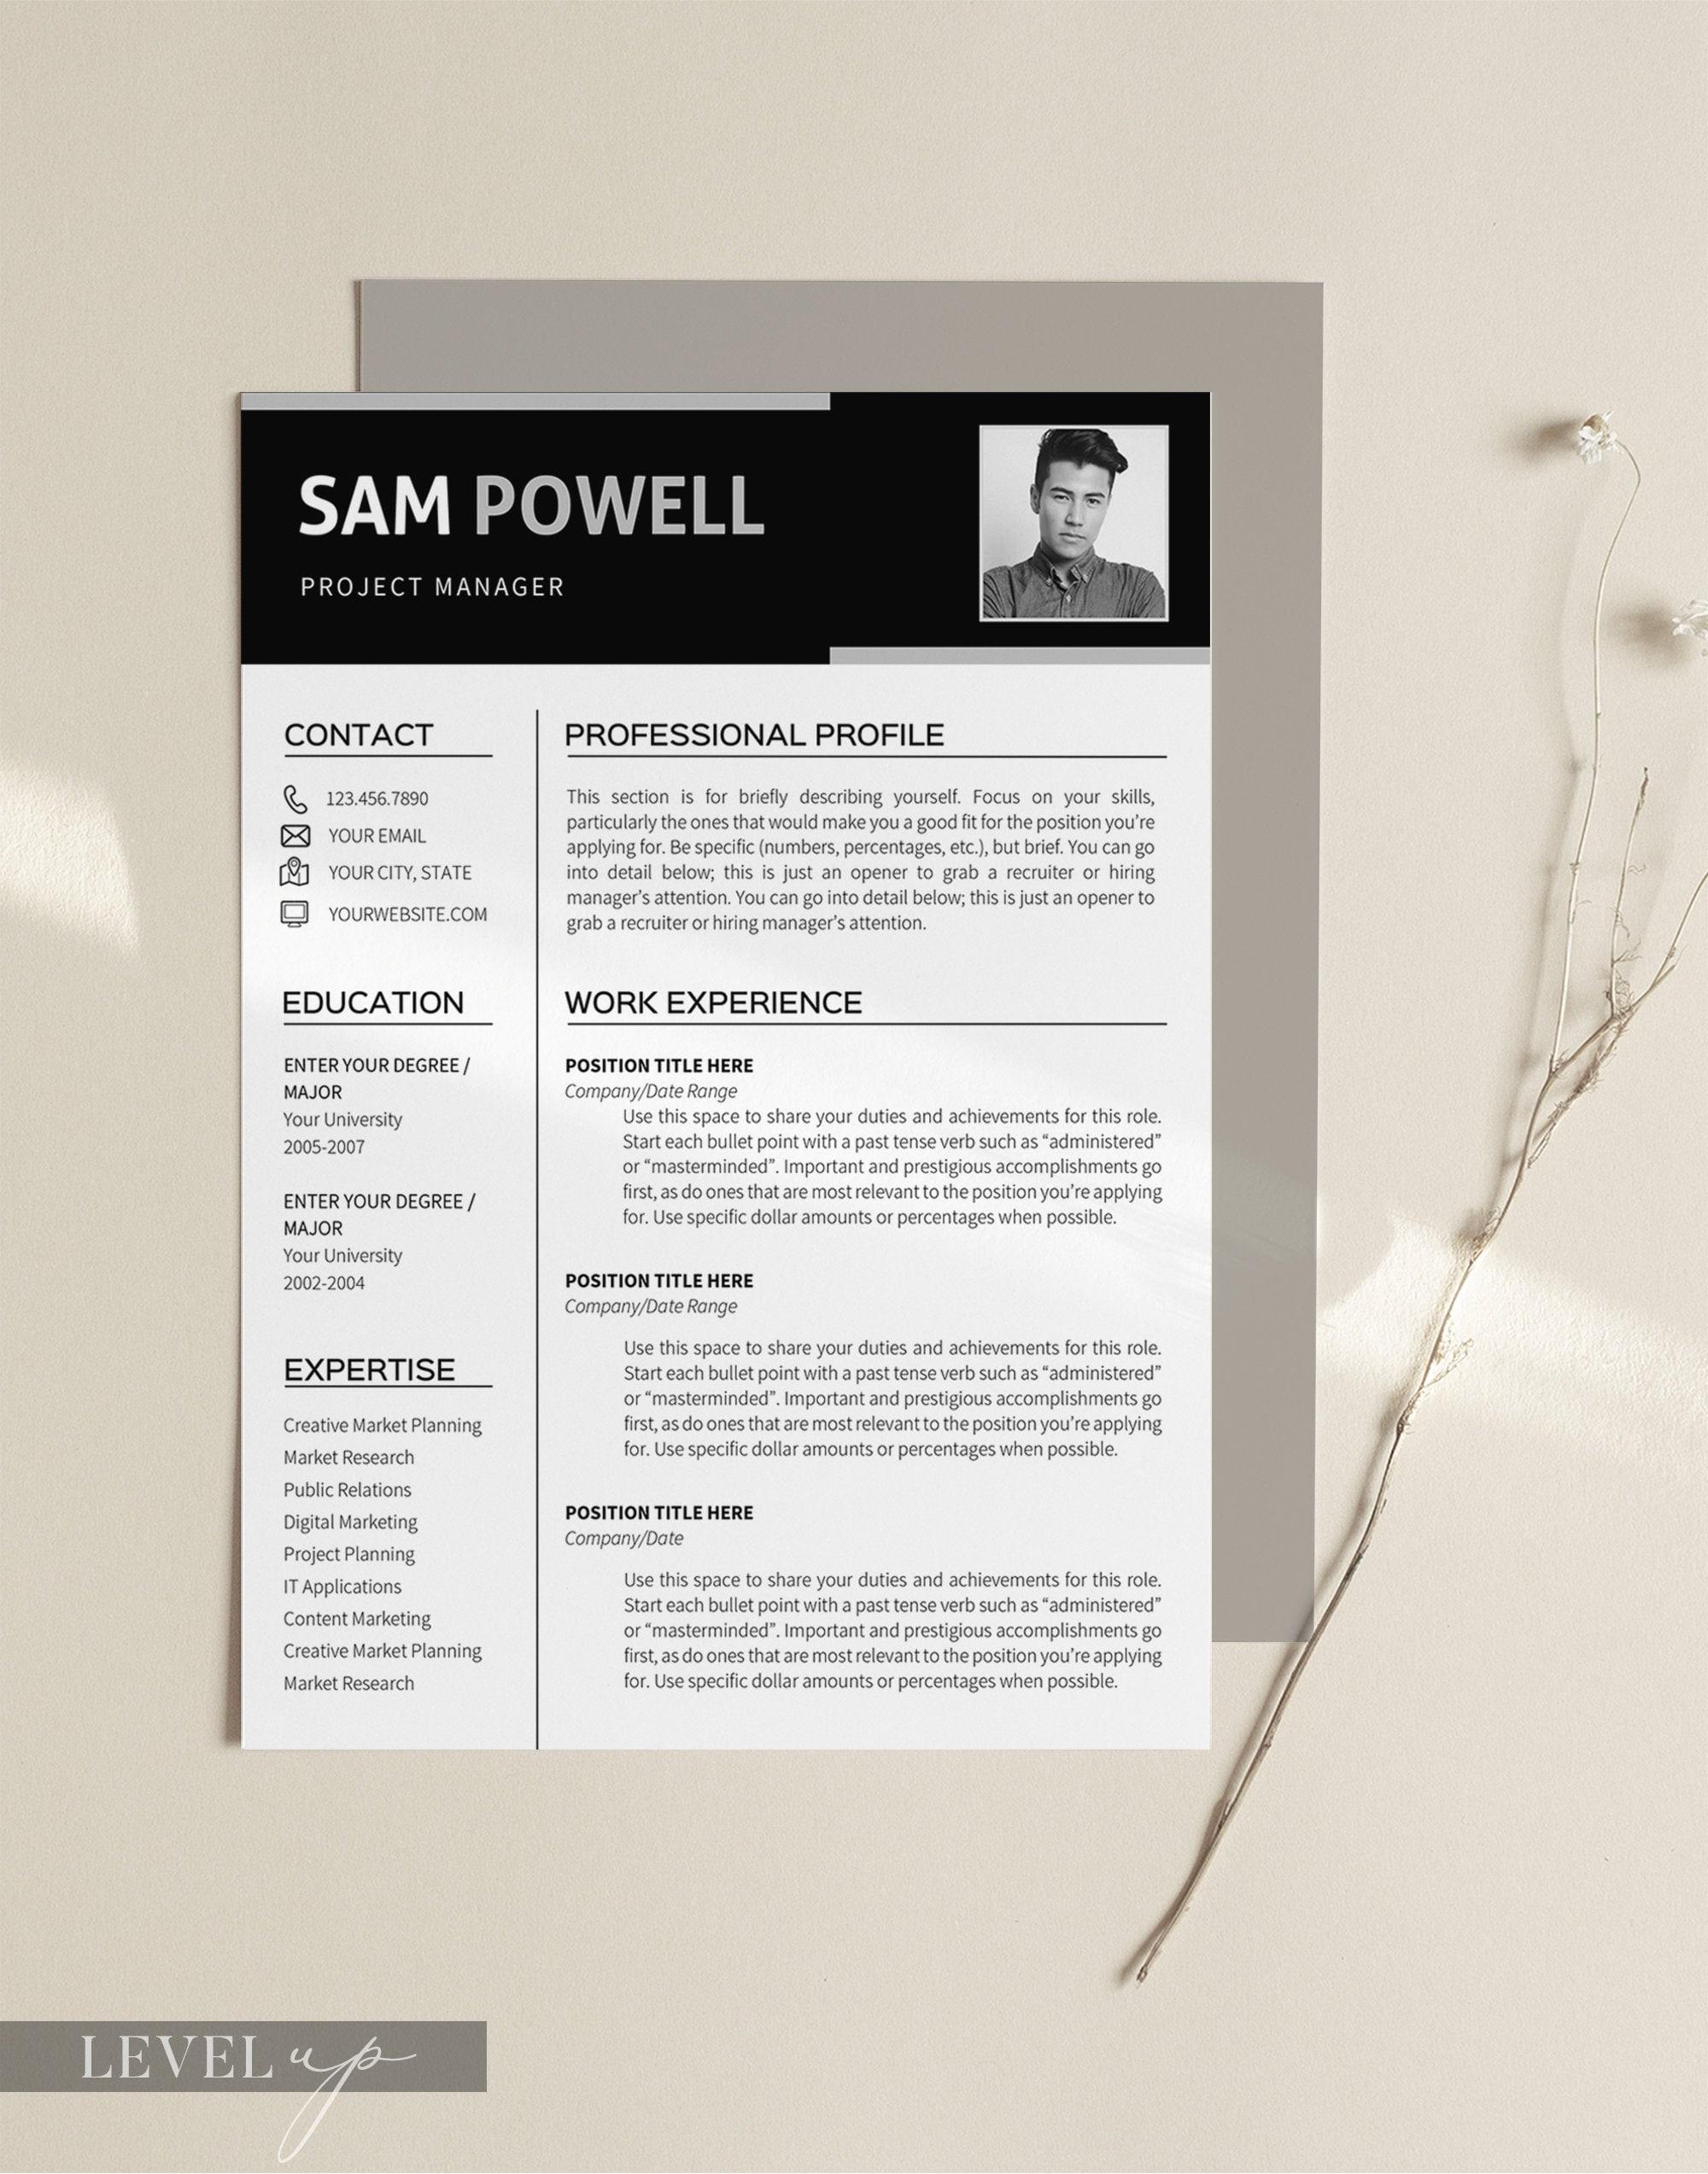 CV Vorlage Mens Resume Vorlage College Lebenslauf Vorlage Engineering  Manager Männer Lebenslauf Entwicklung Manager Research Manager Patentanwalt